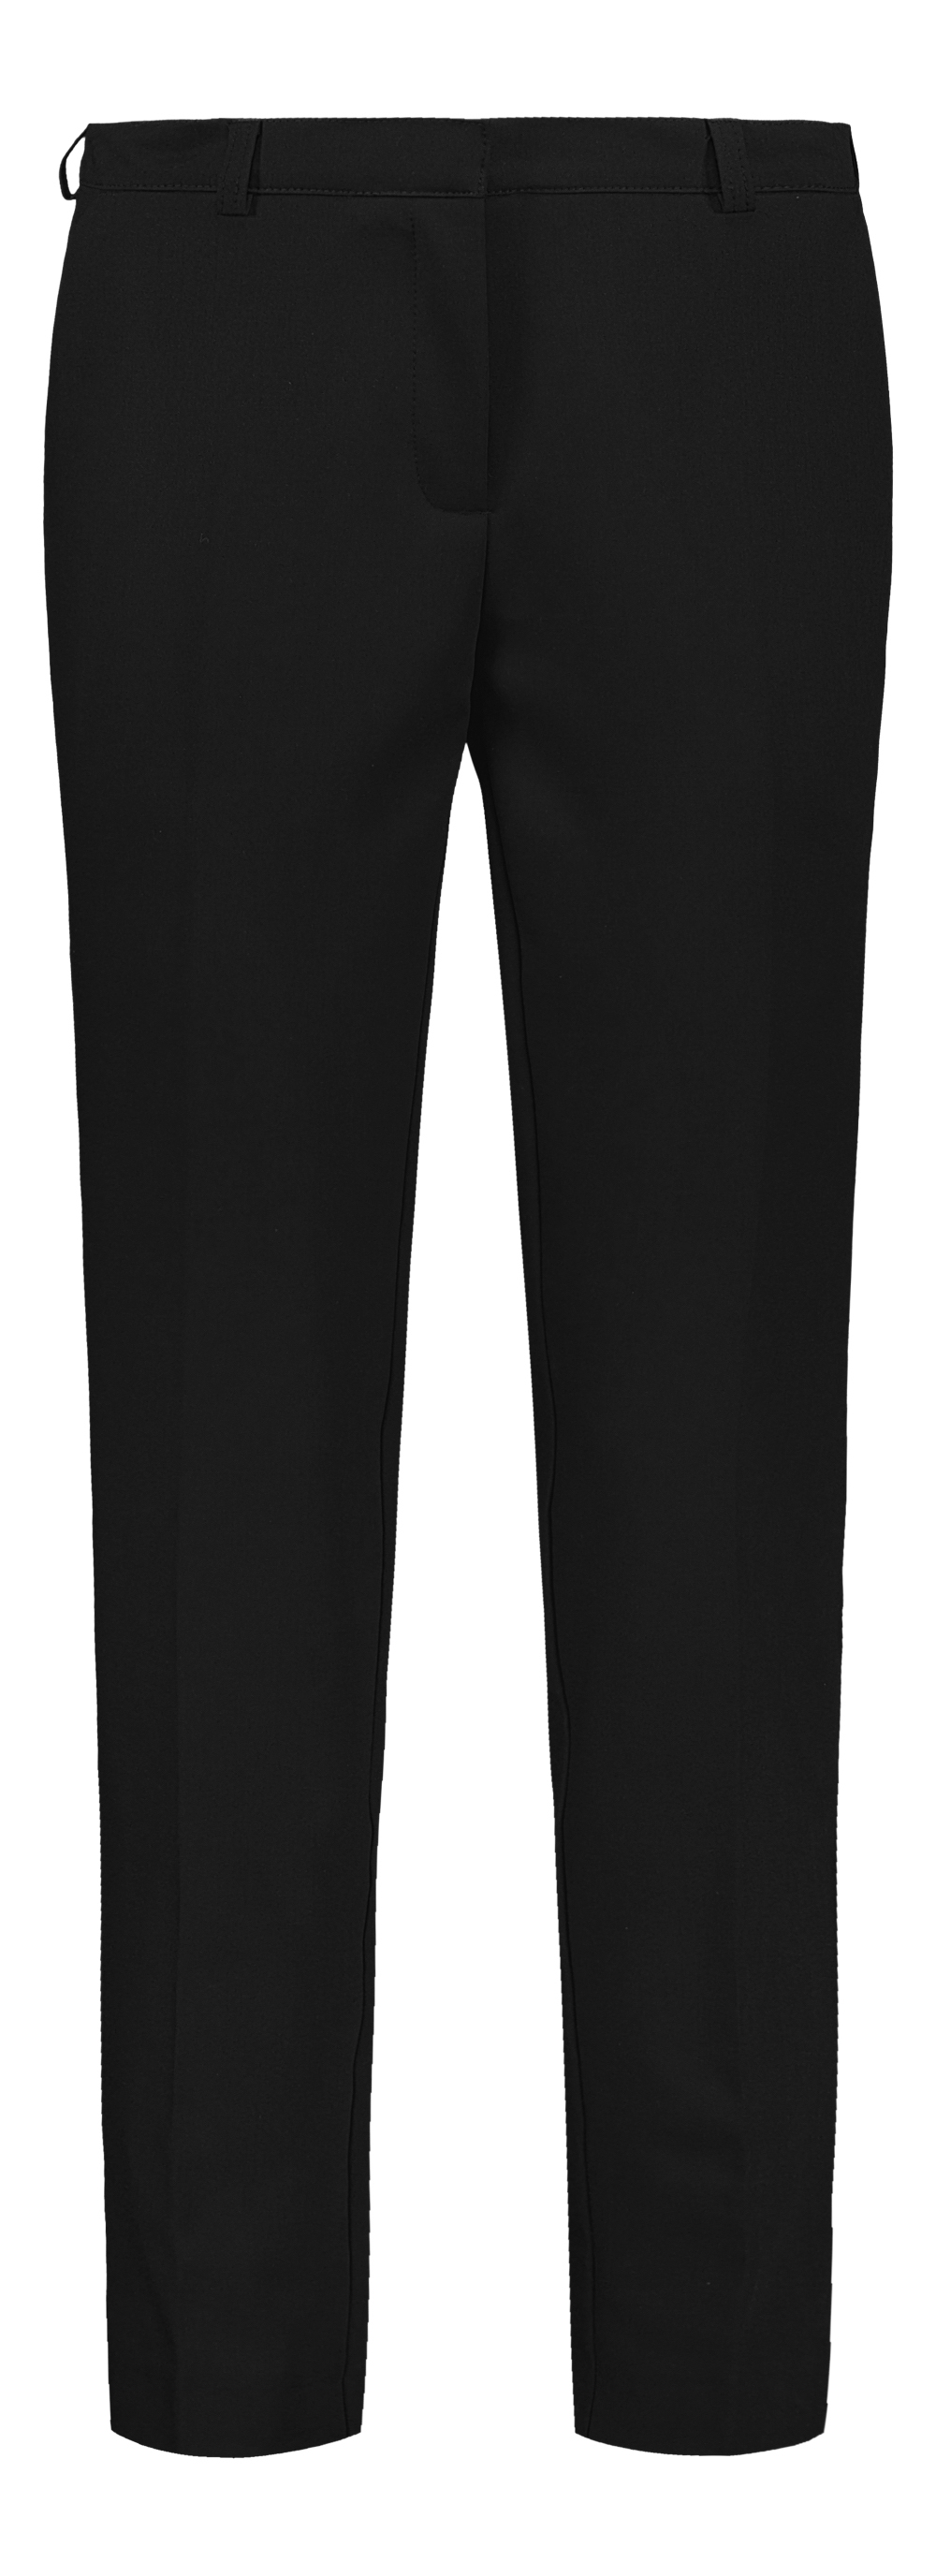 Victoria naisten housut, musta